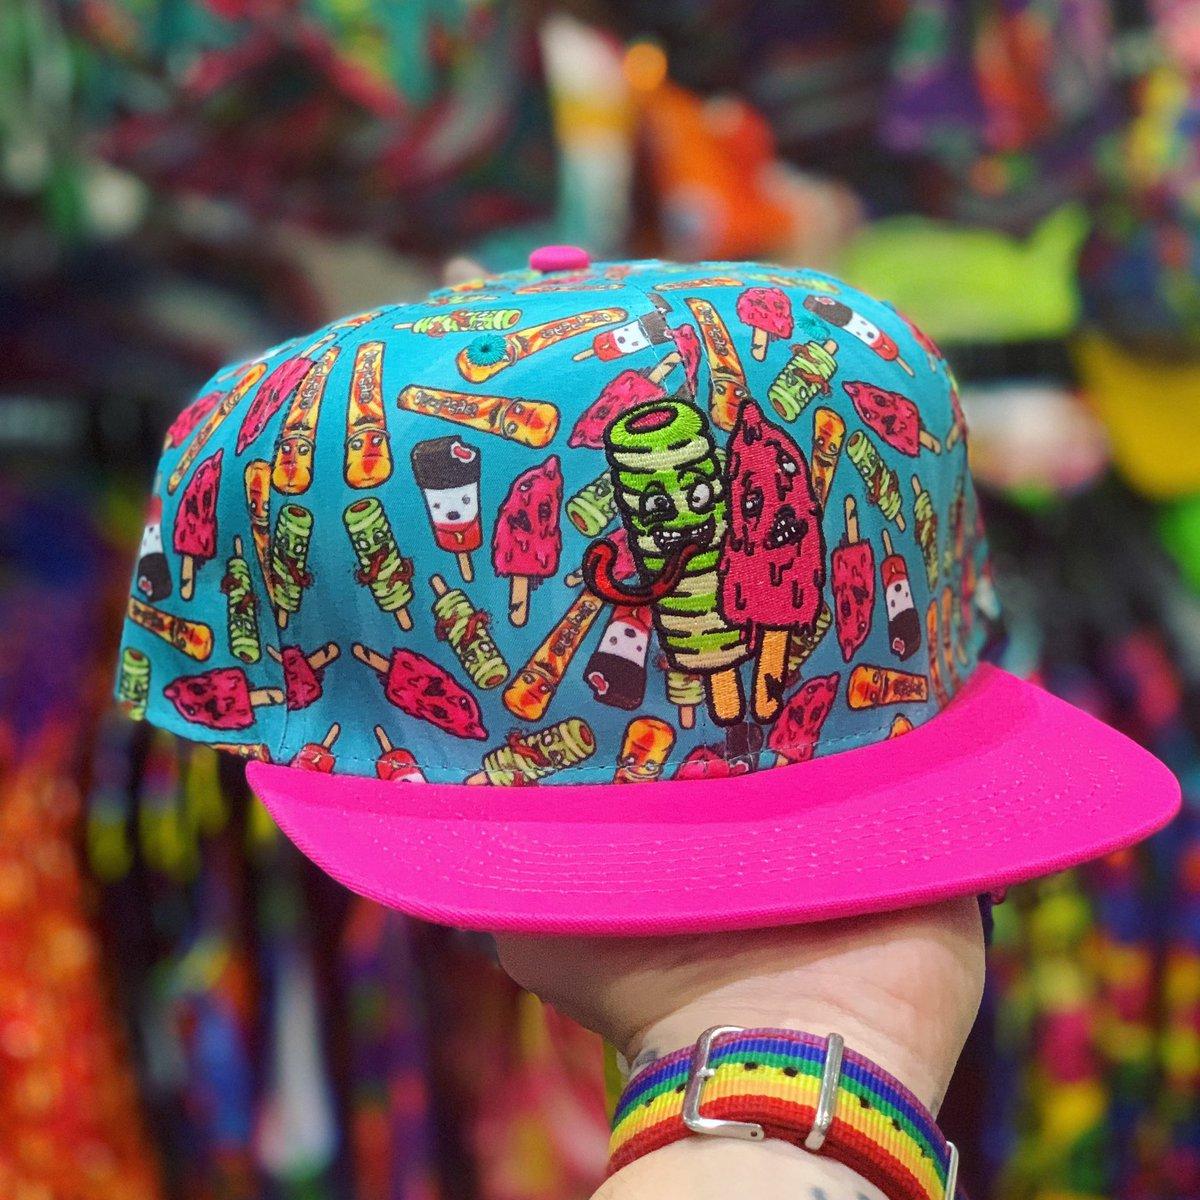 Want to turn heads? Check out our crazy colourful range of SnapBacks!   https://offendmyeyes.co.uk/hats-and-caps/215-suckers-snapback-cap.html…  #snapback #snapbackcap #cap #peak #hat #snapbackswag #snapbackoriginal #snapbackboy #snapbackcustom pic.twitter.com/je7WxjijB6